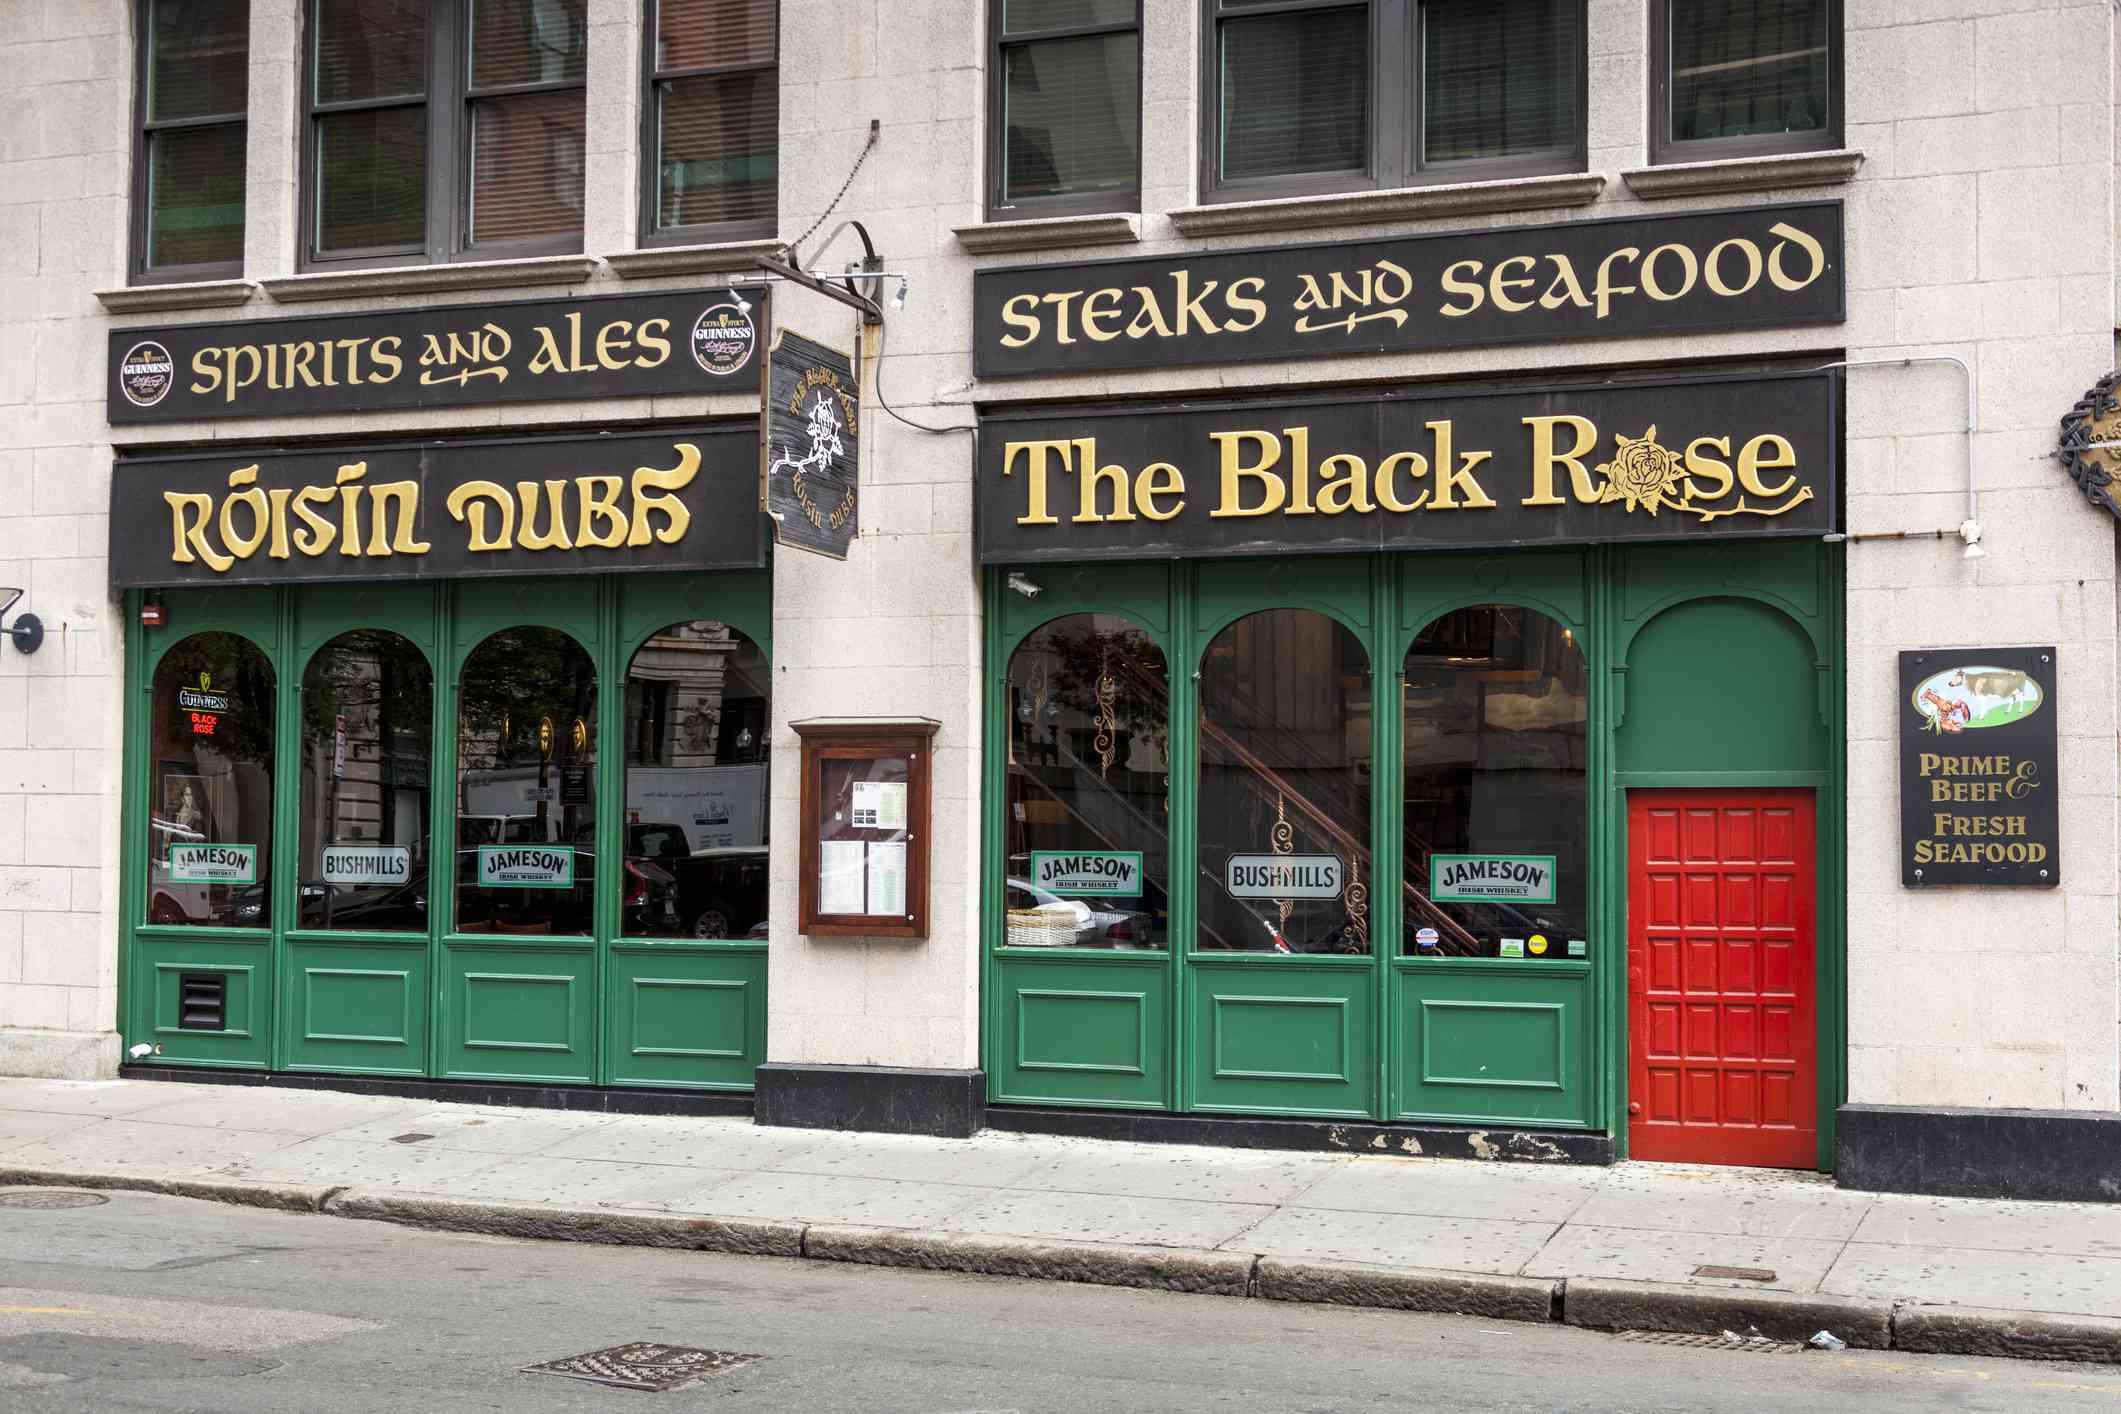 Roisin Dubh, Black Rose, Irish pub and restaurant, State Street, Boston, Massachusetts, USA